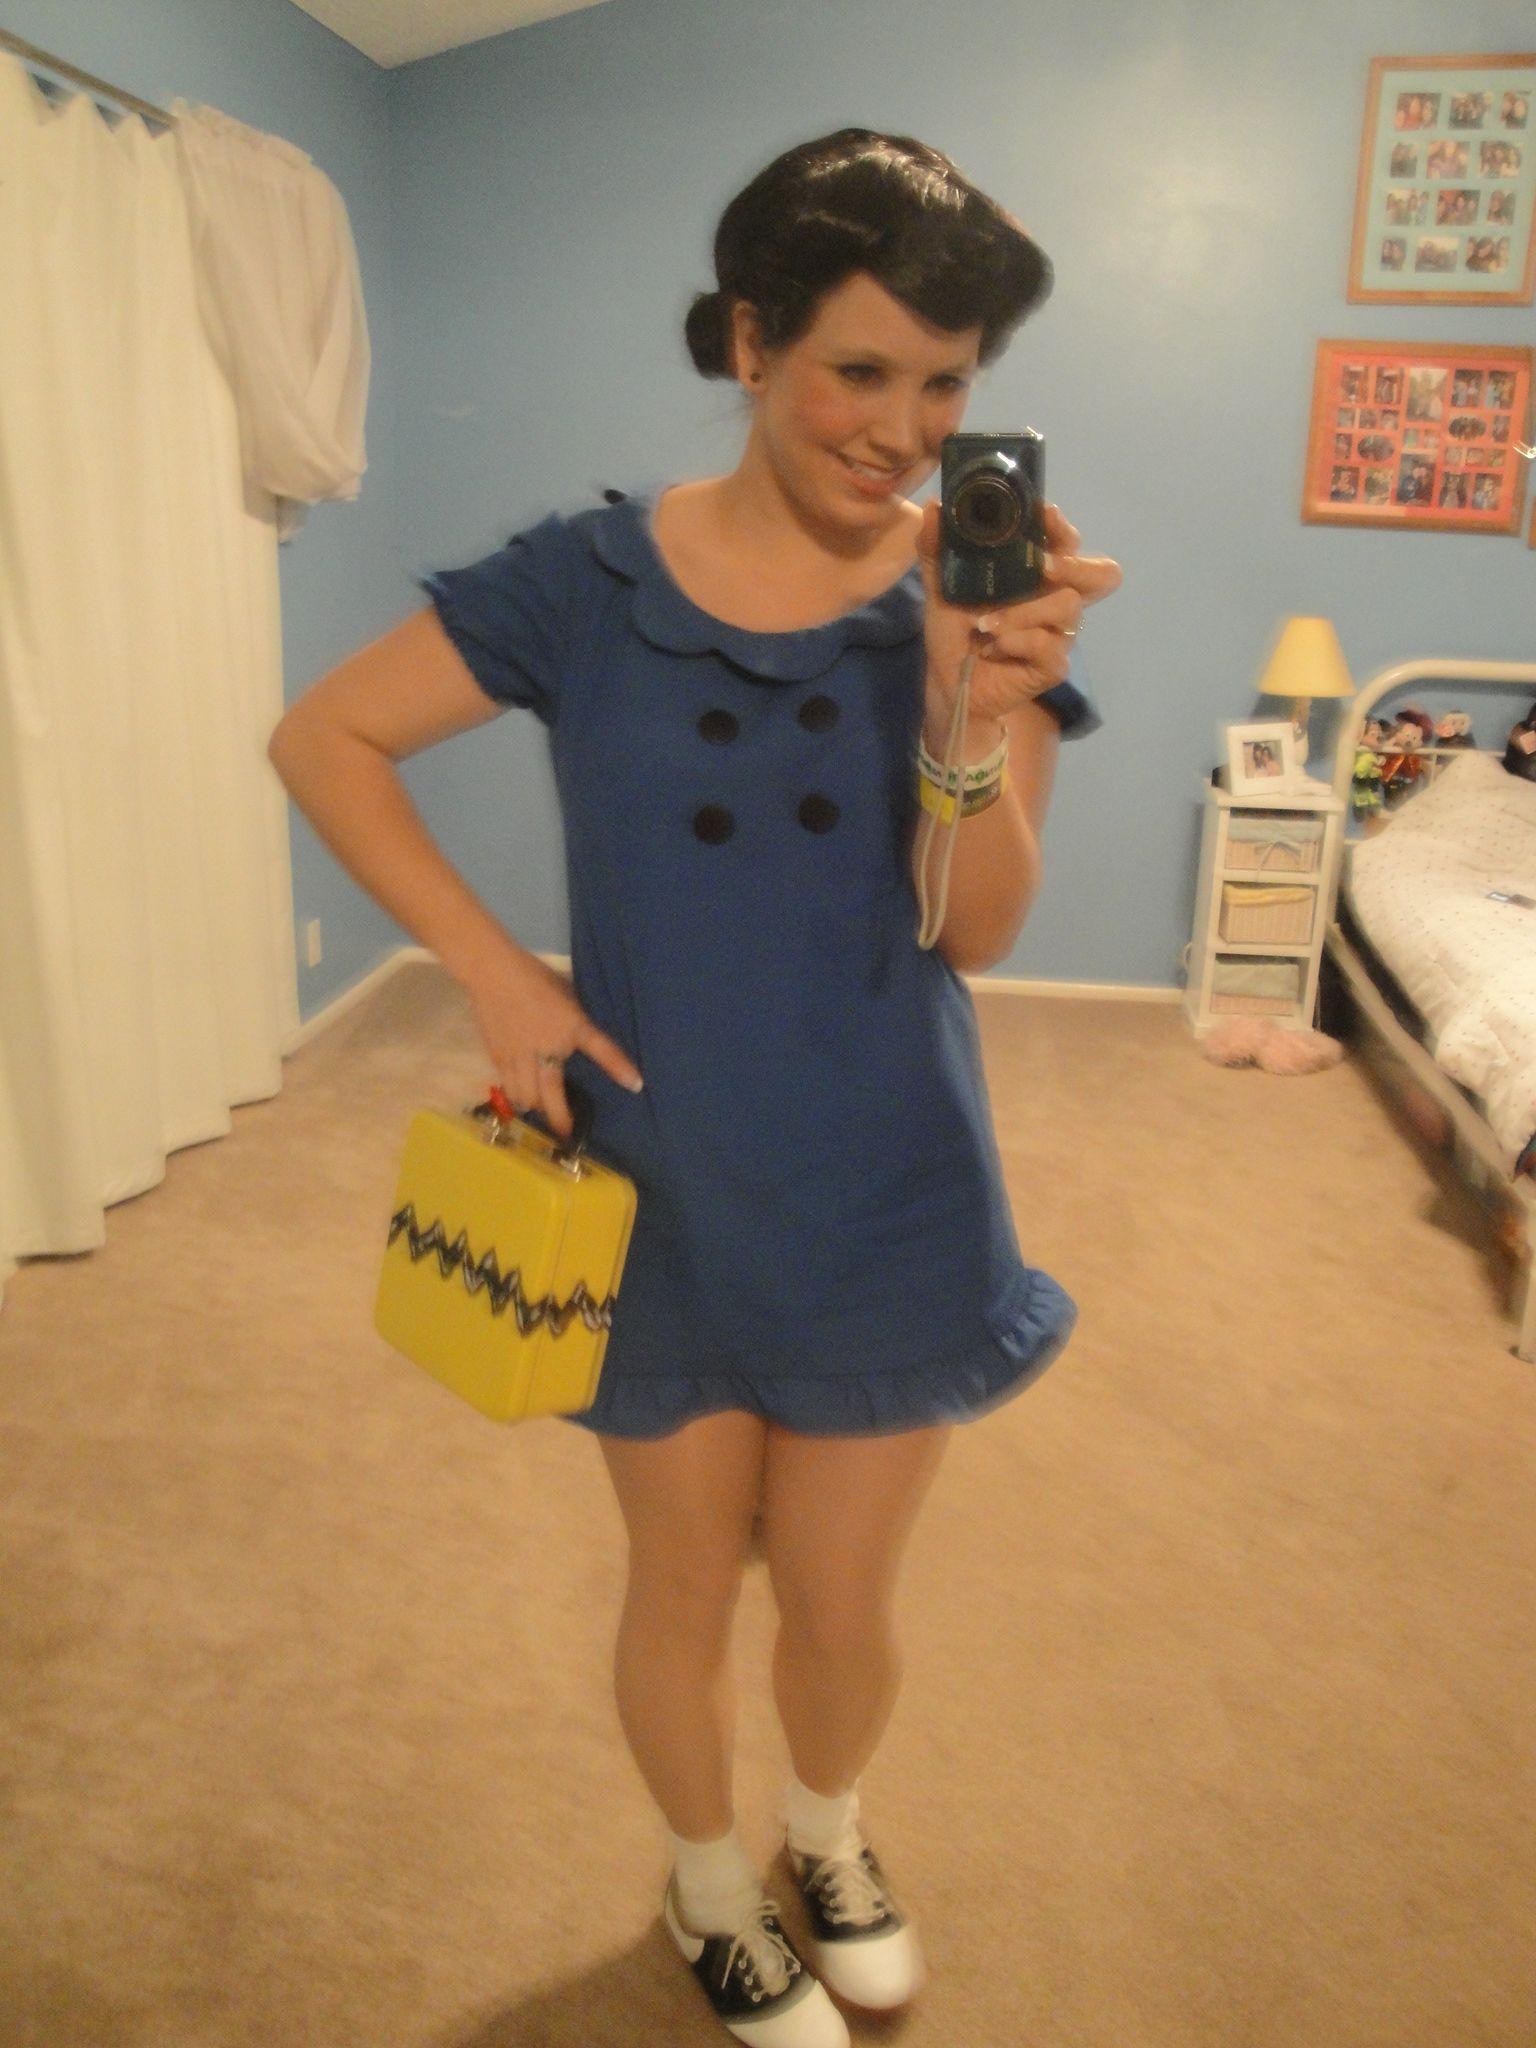 Peanuts Lucy Van Pelt Costume